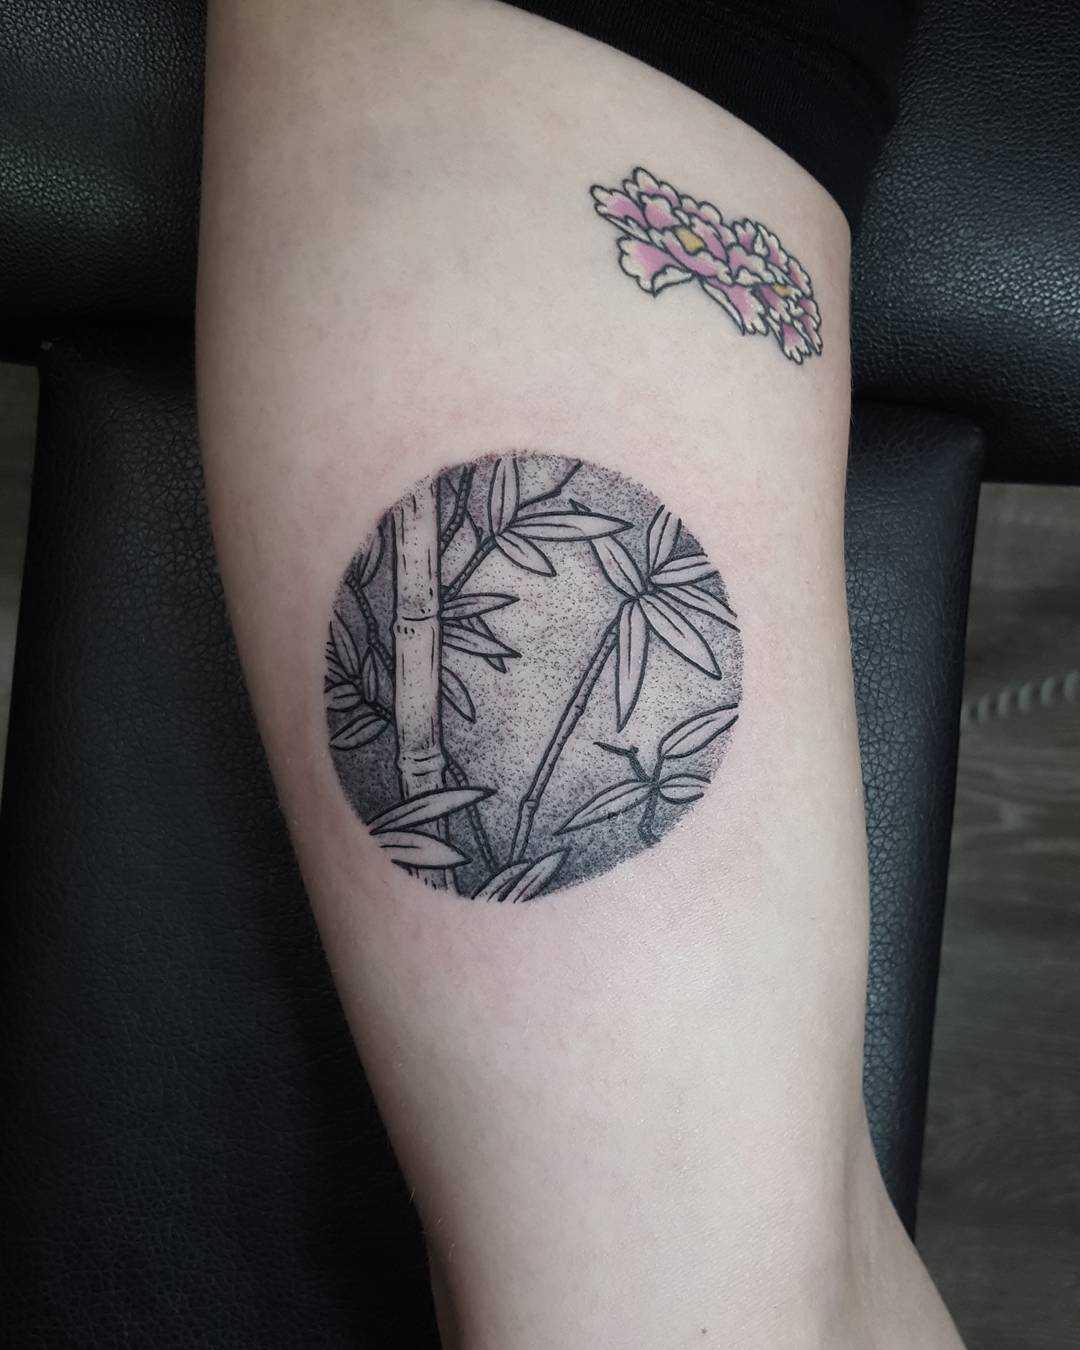 Little jungle scenery tattoo